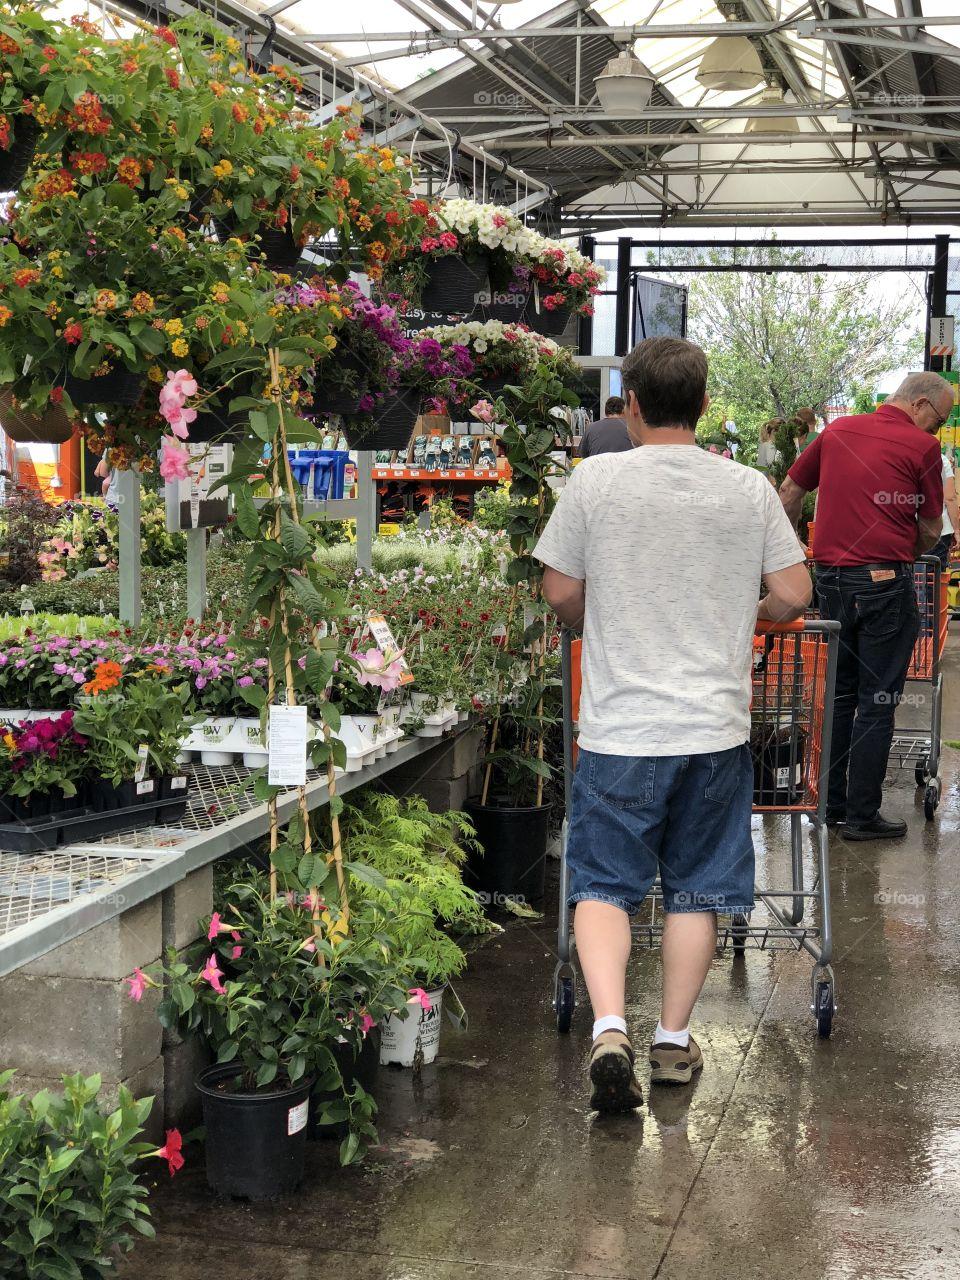 Shopping for flowers